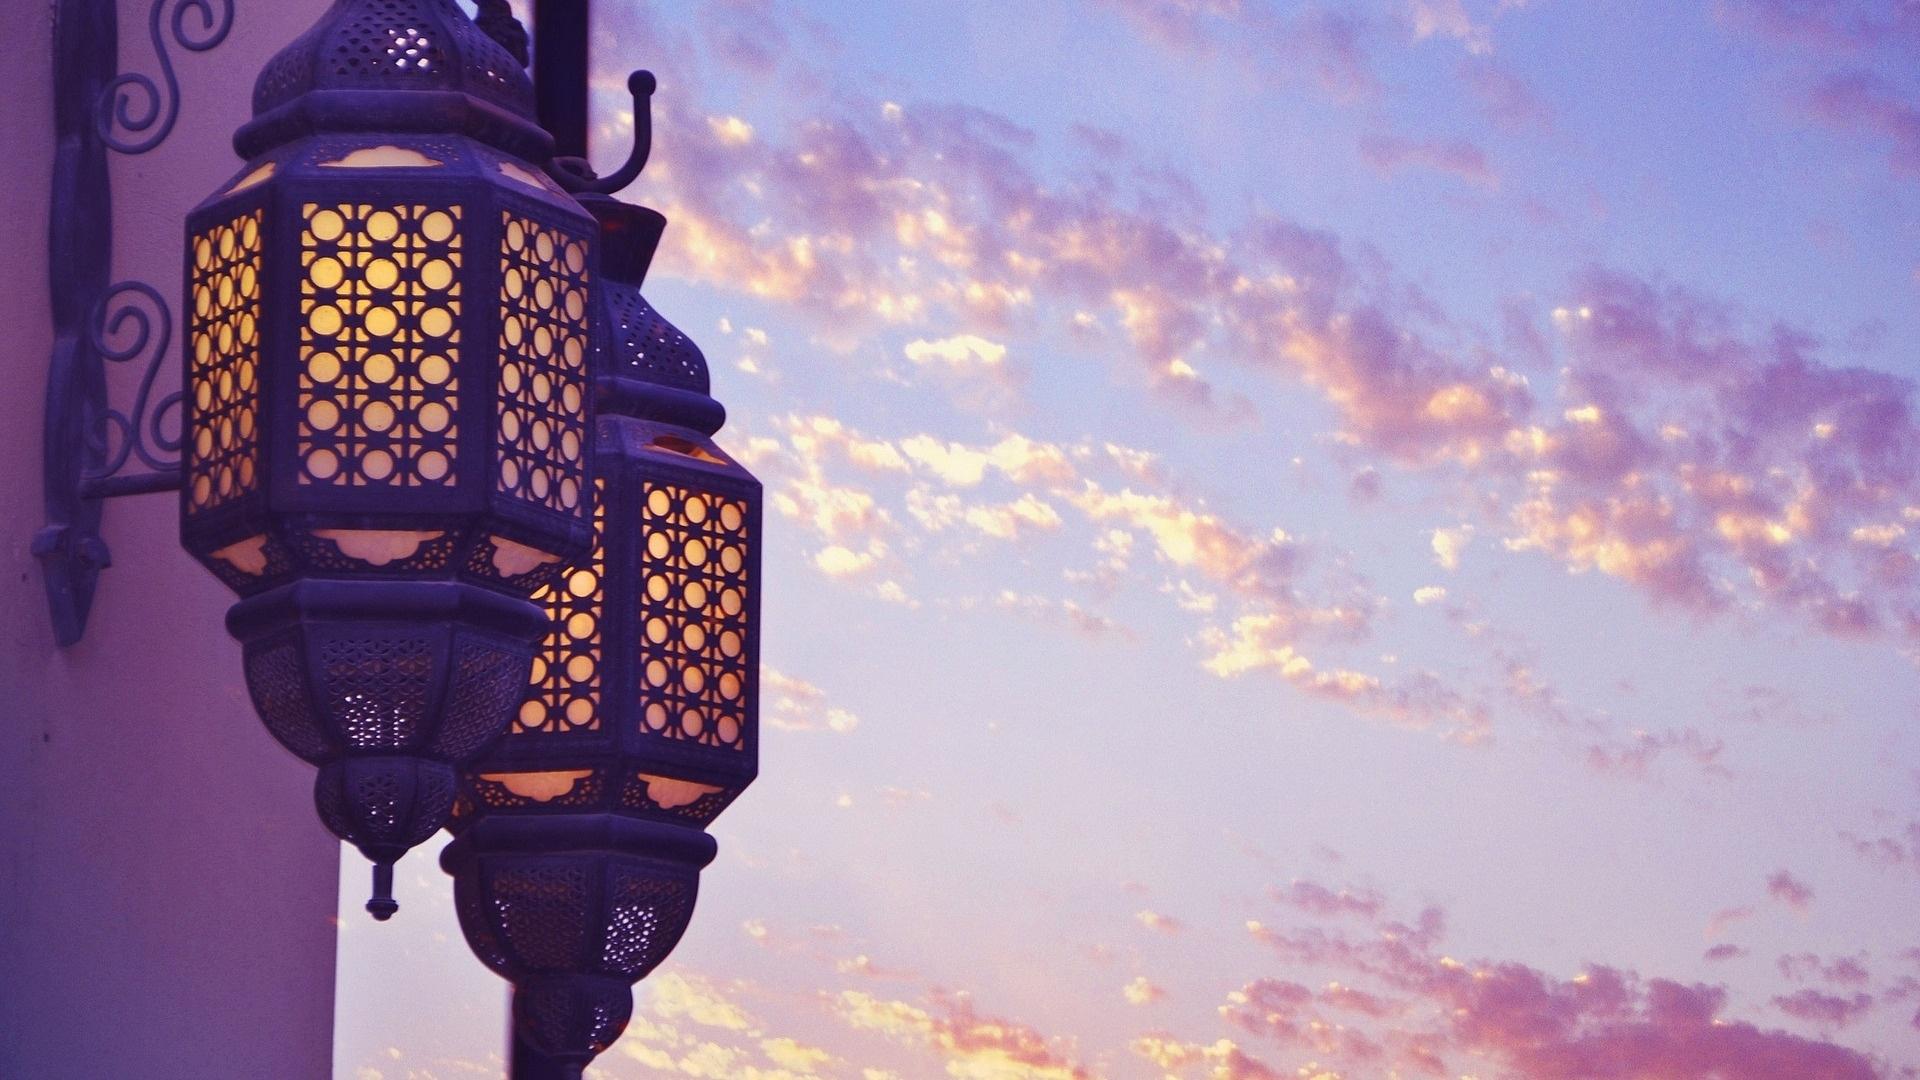 Lantern Picture